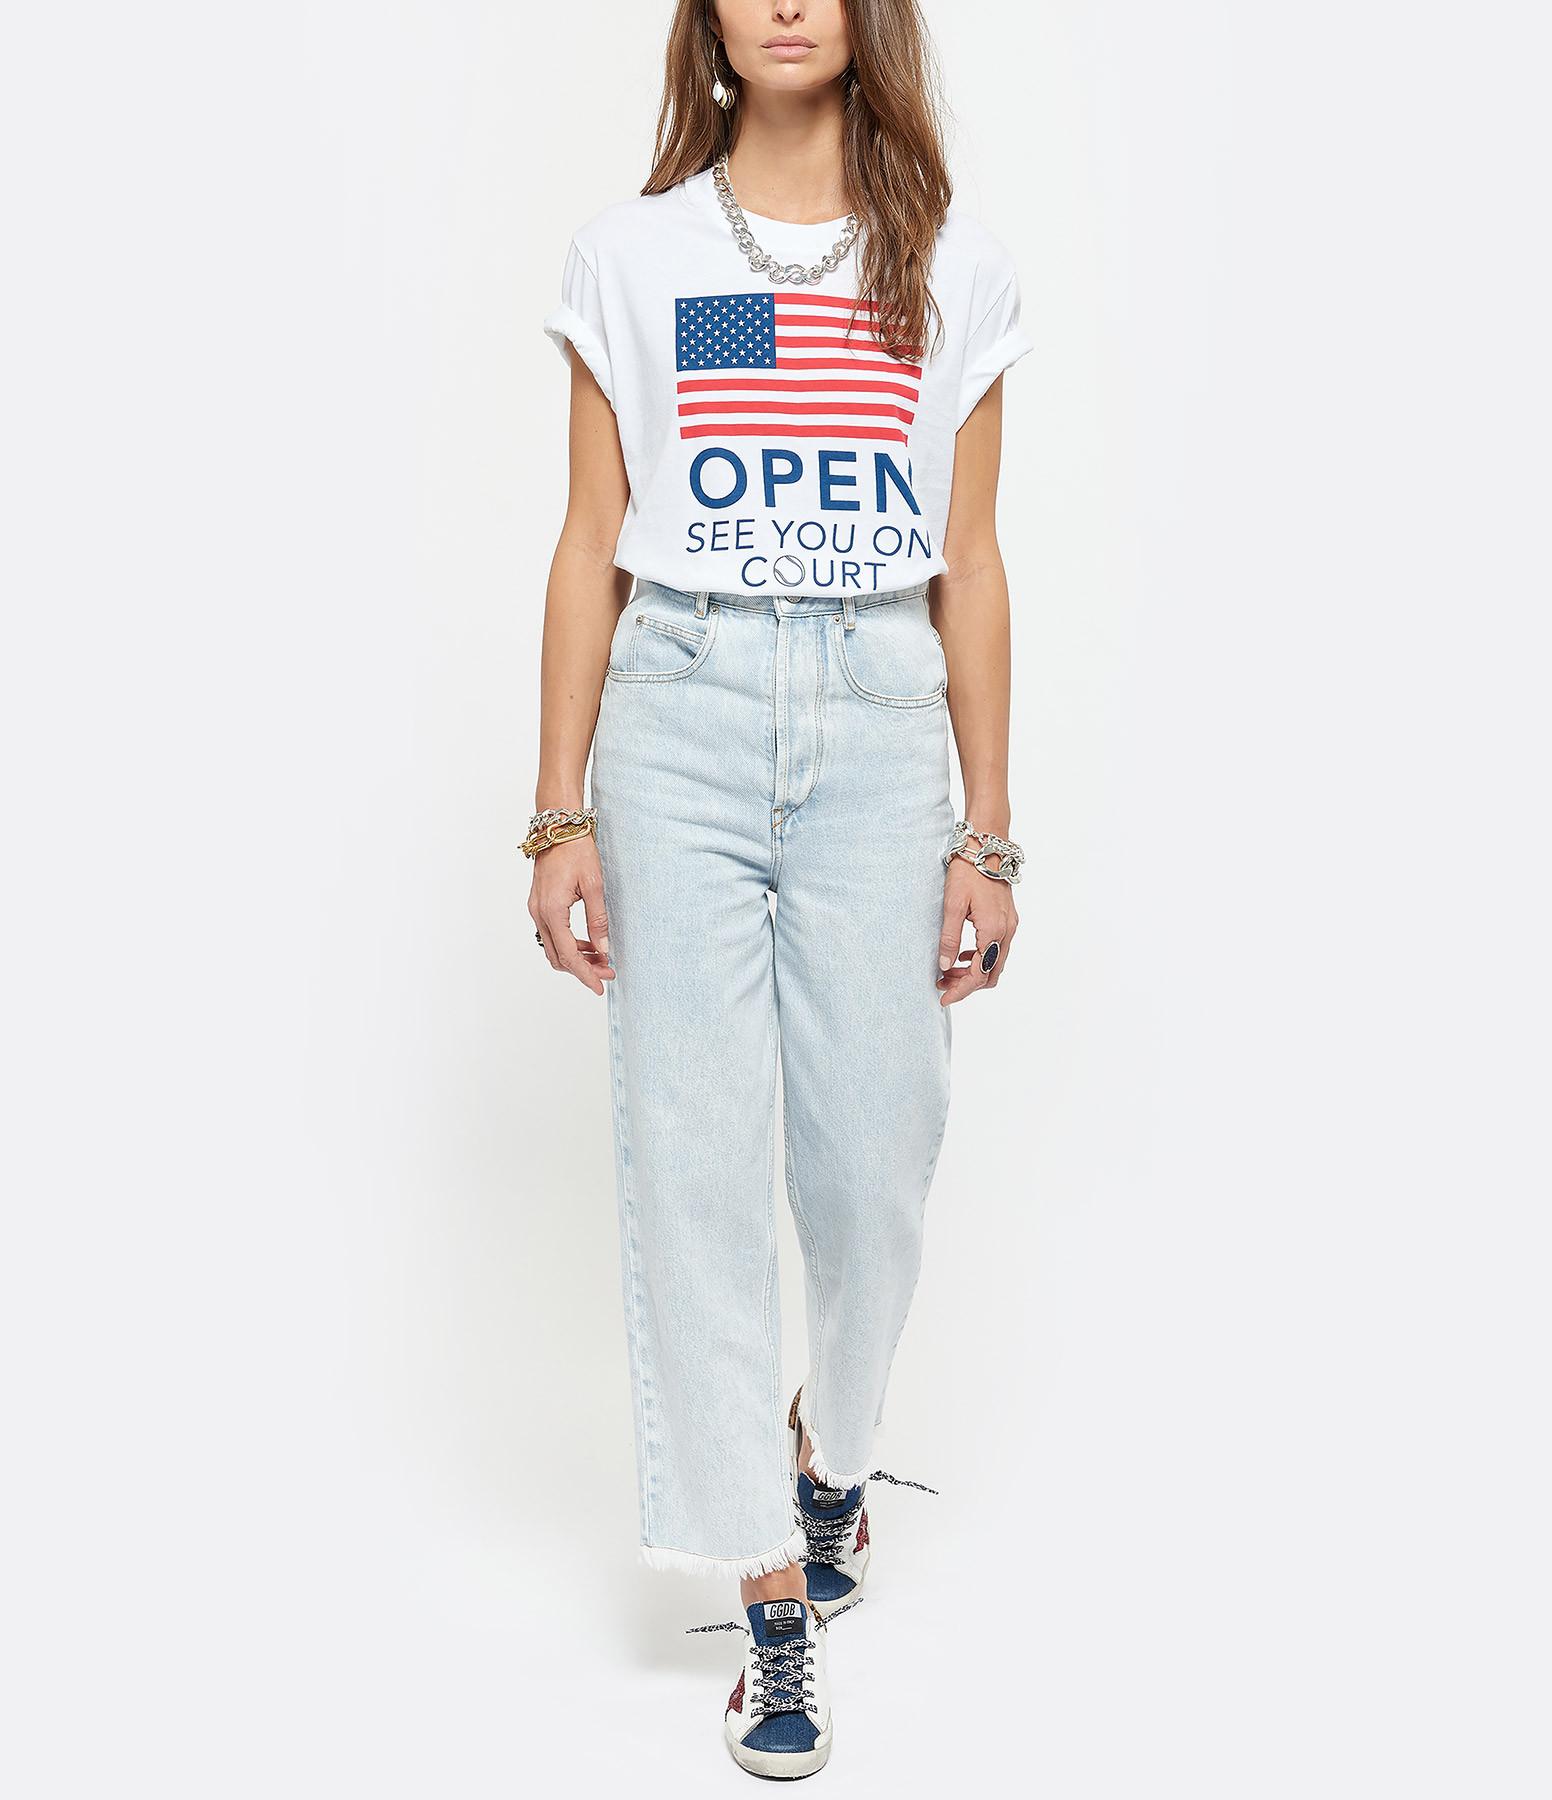 AUTRY - Tee-shirt Flag Coton Blanc, Capsule